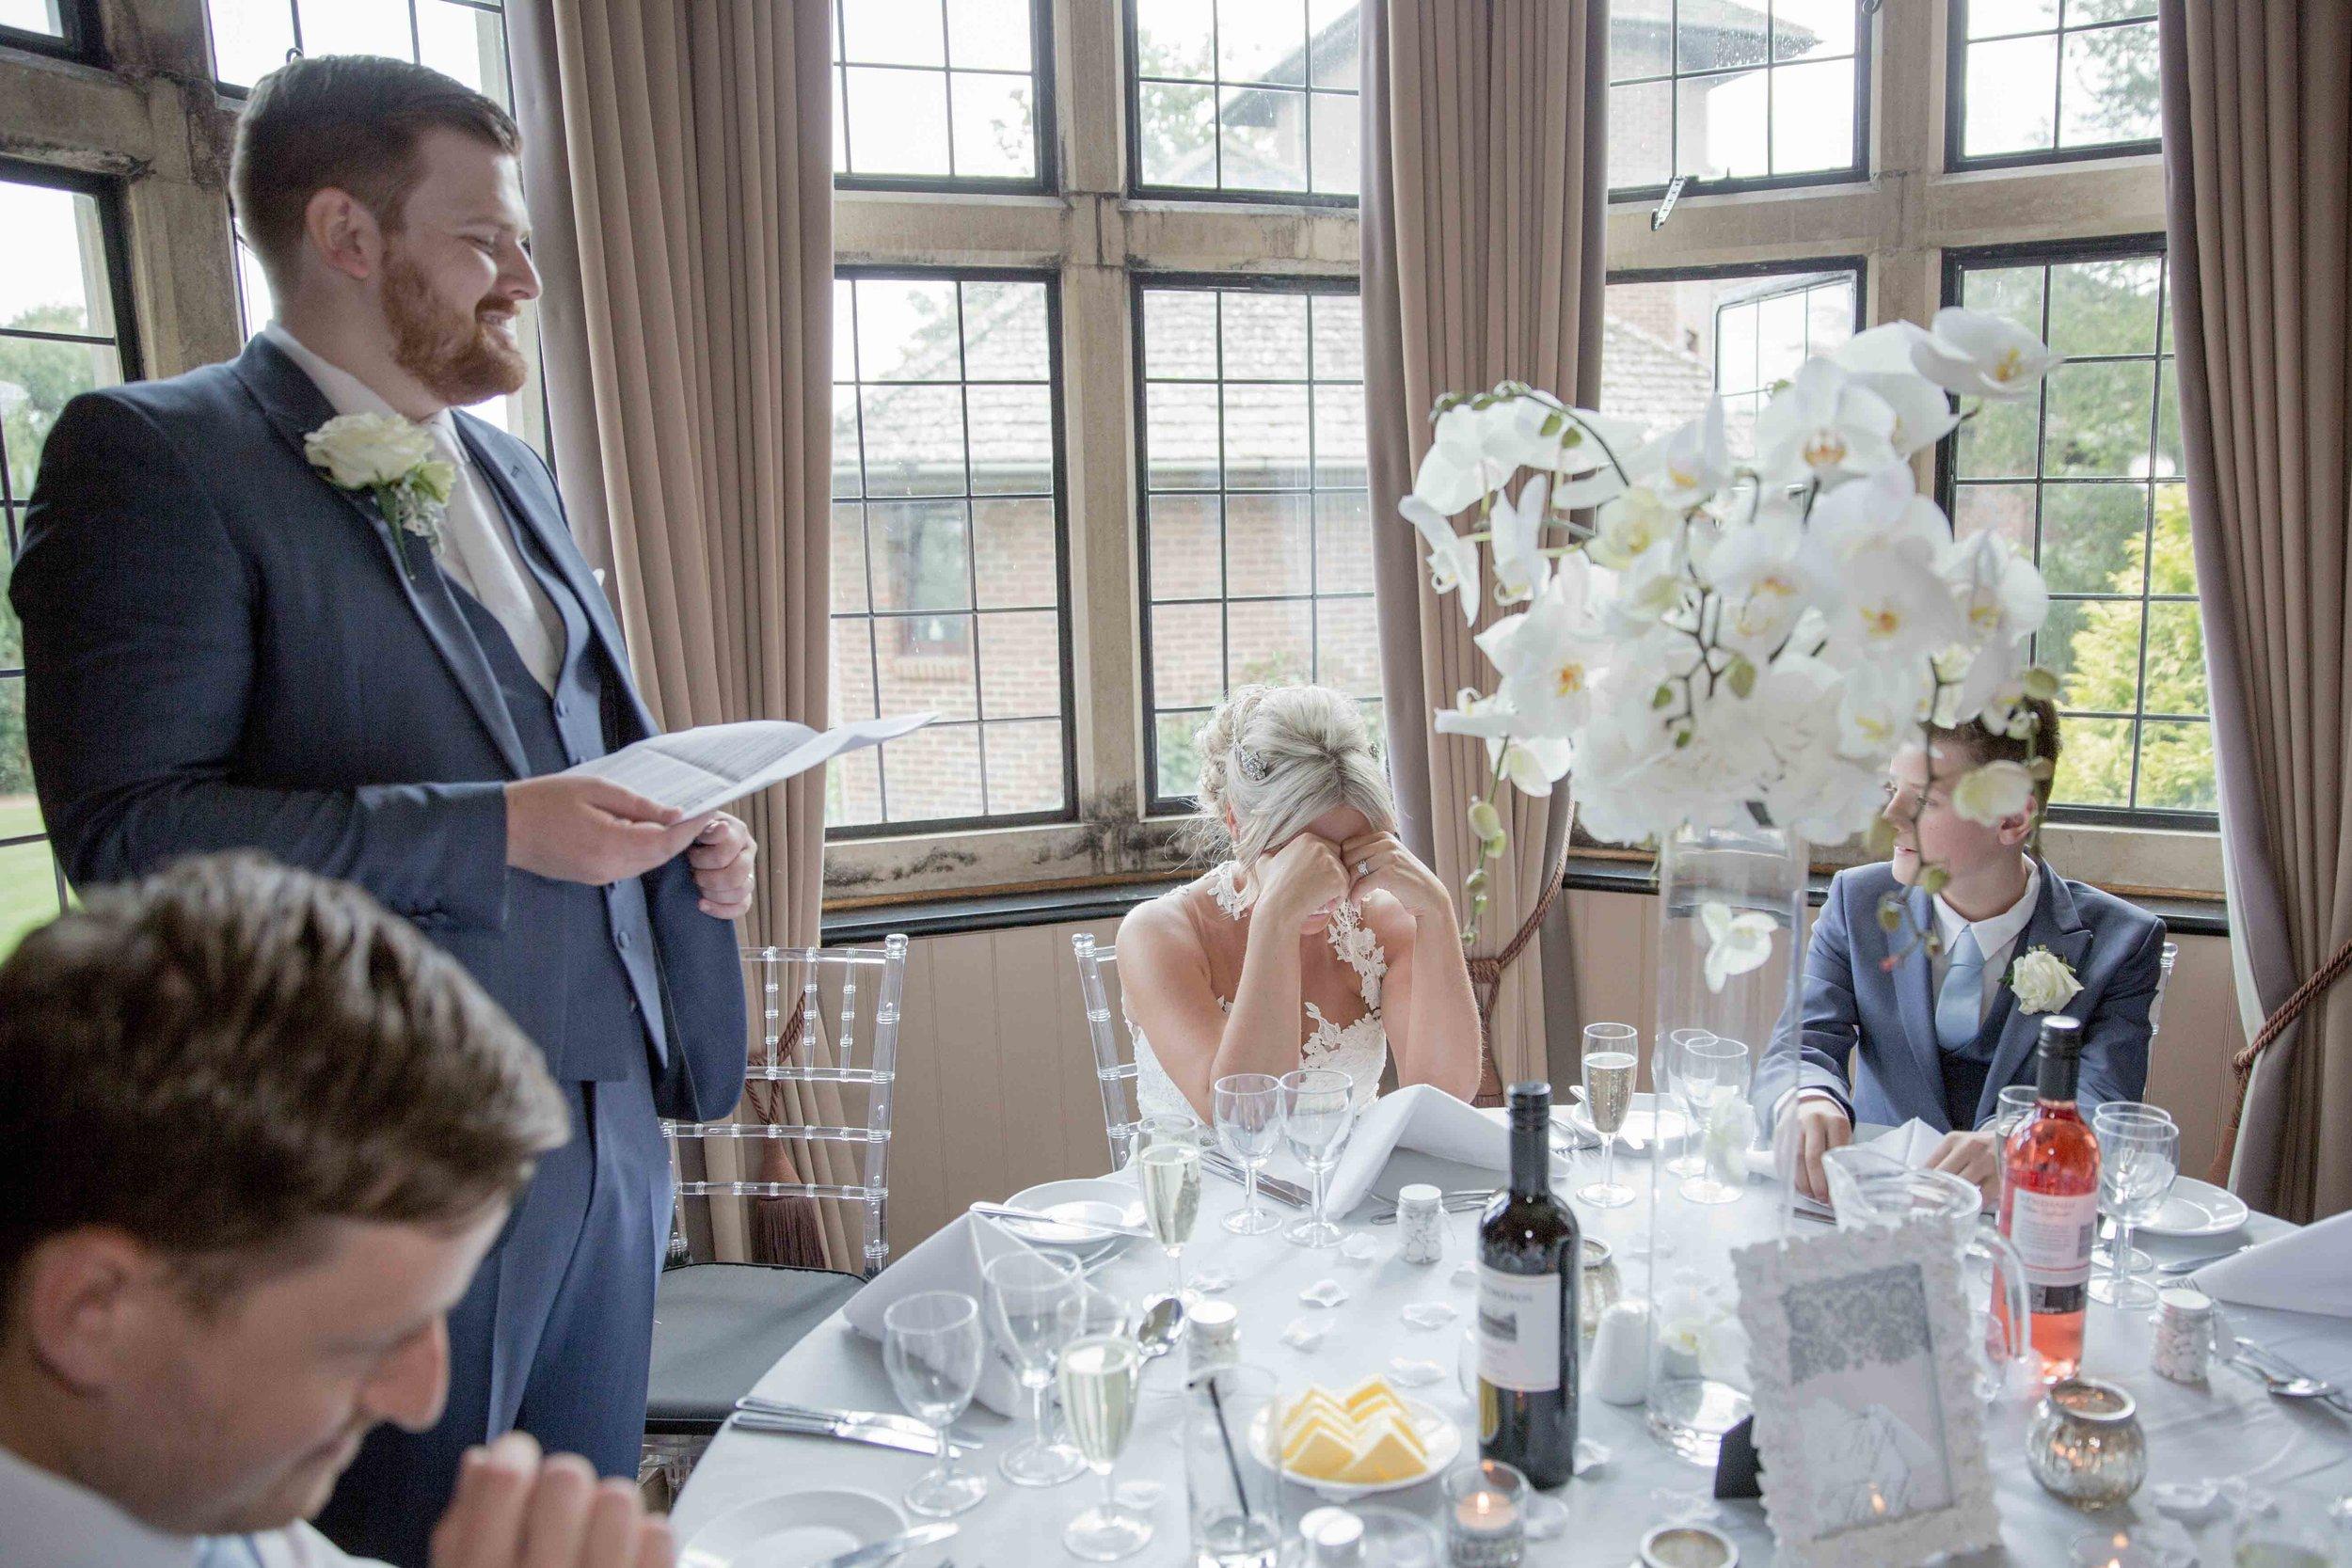 cotswold-wedding-photography-at-stonehouse-court-hotel-natalia-smith-photography-gloucestershire-wedding-photographer-78.jpg